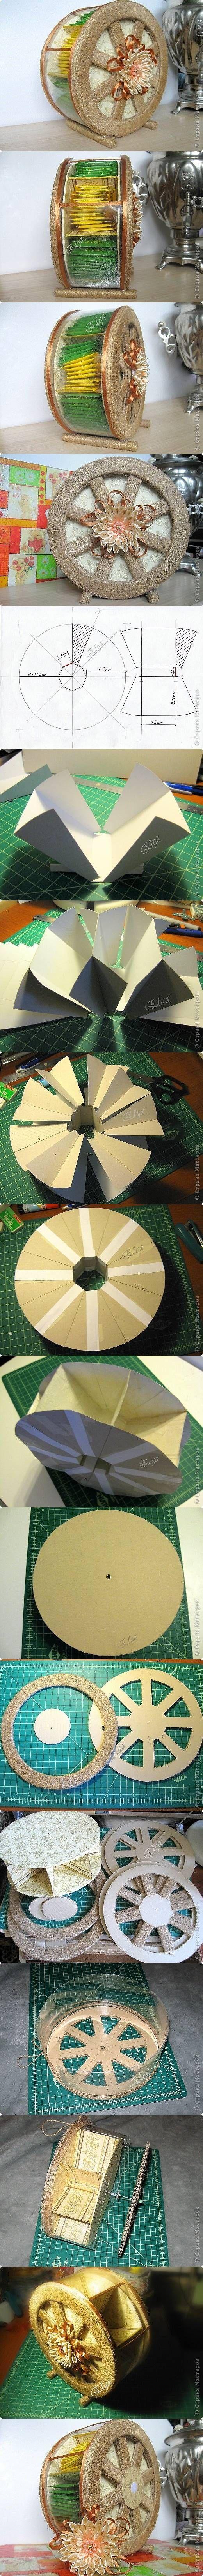 DIY Handmade Tea Wheel via usefuldiy.com